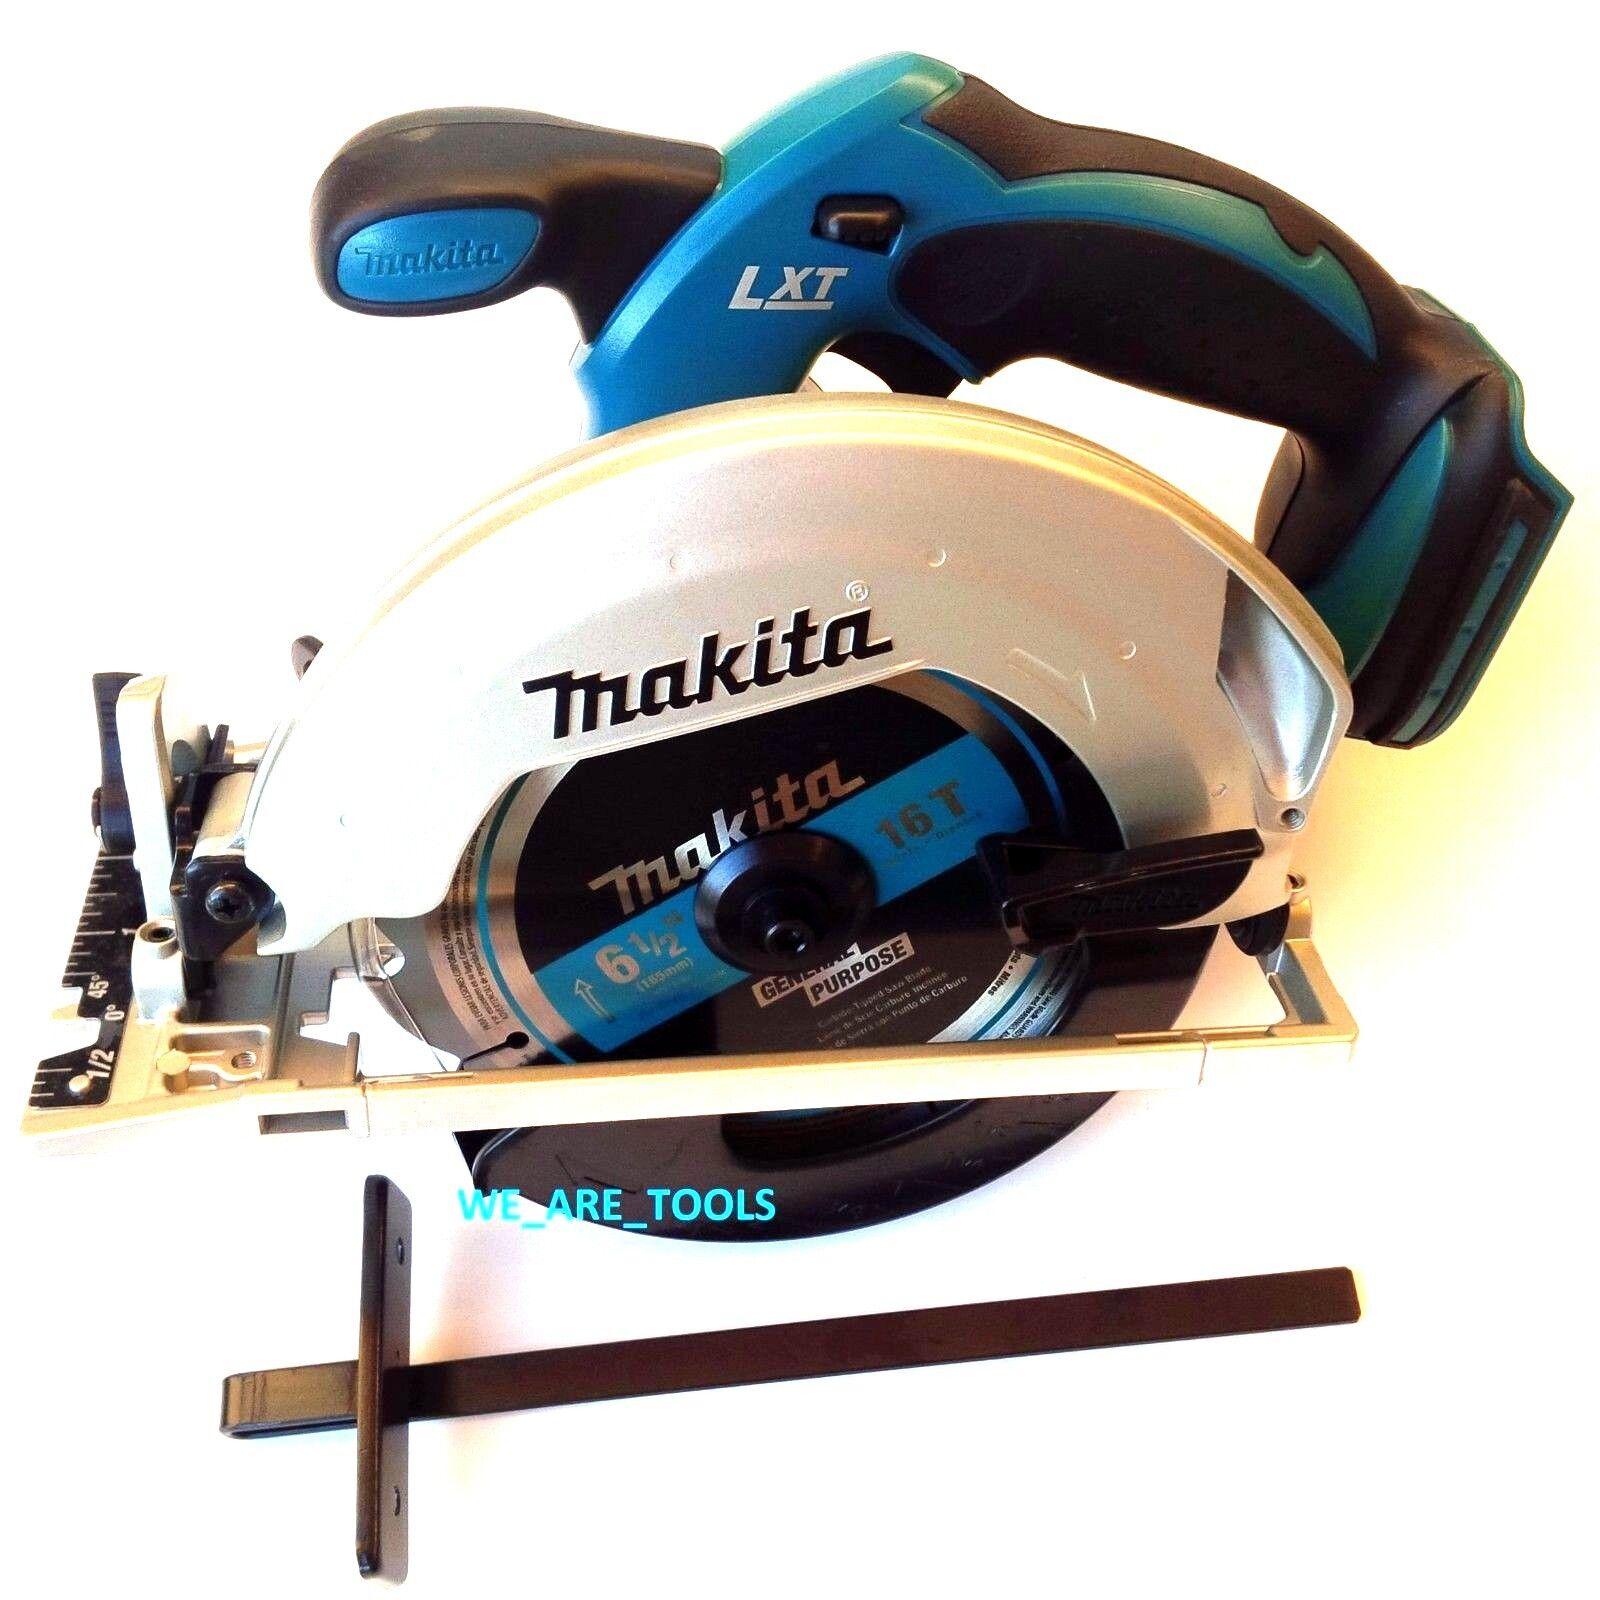 New Makita XSS02 Cordless Battery Circular Saw 18 Volt W/ Blade 18V LXT 6 1/2